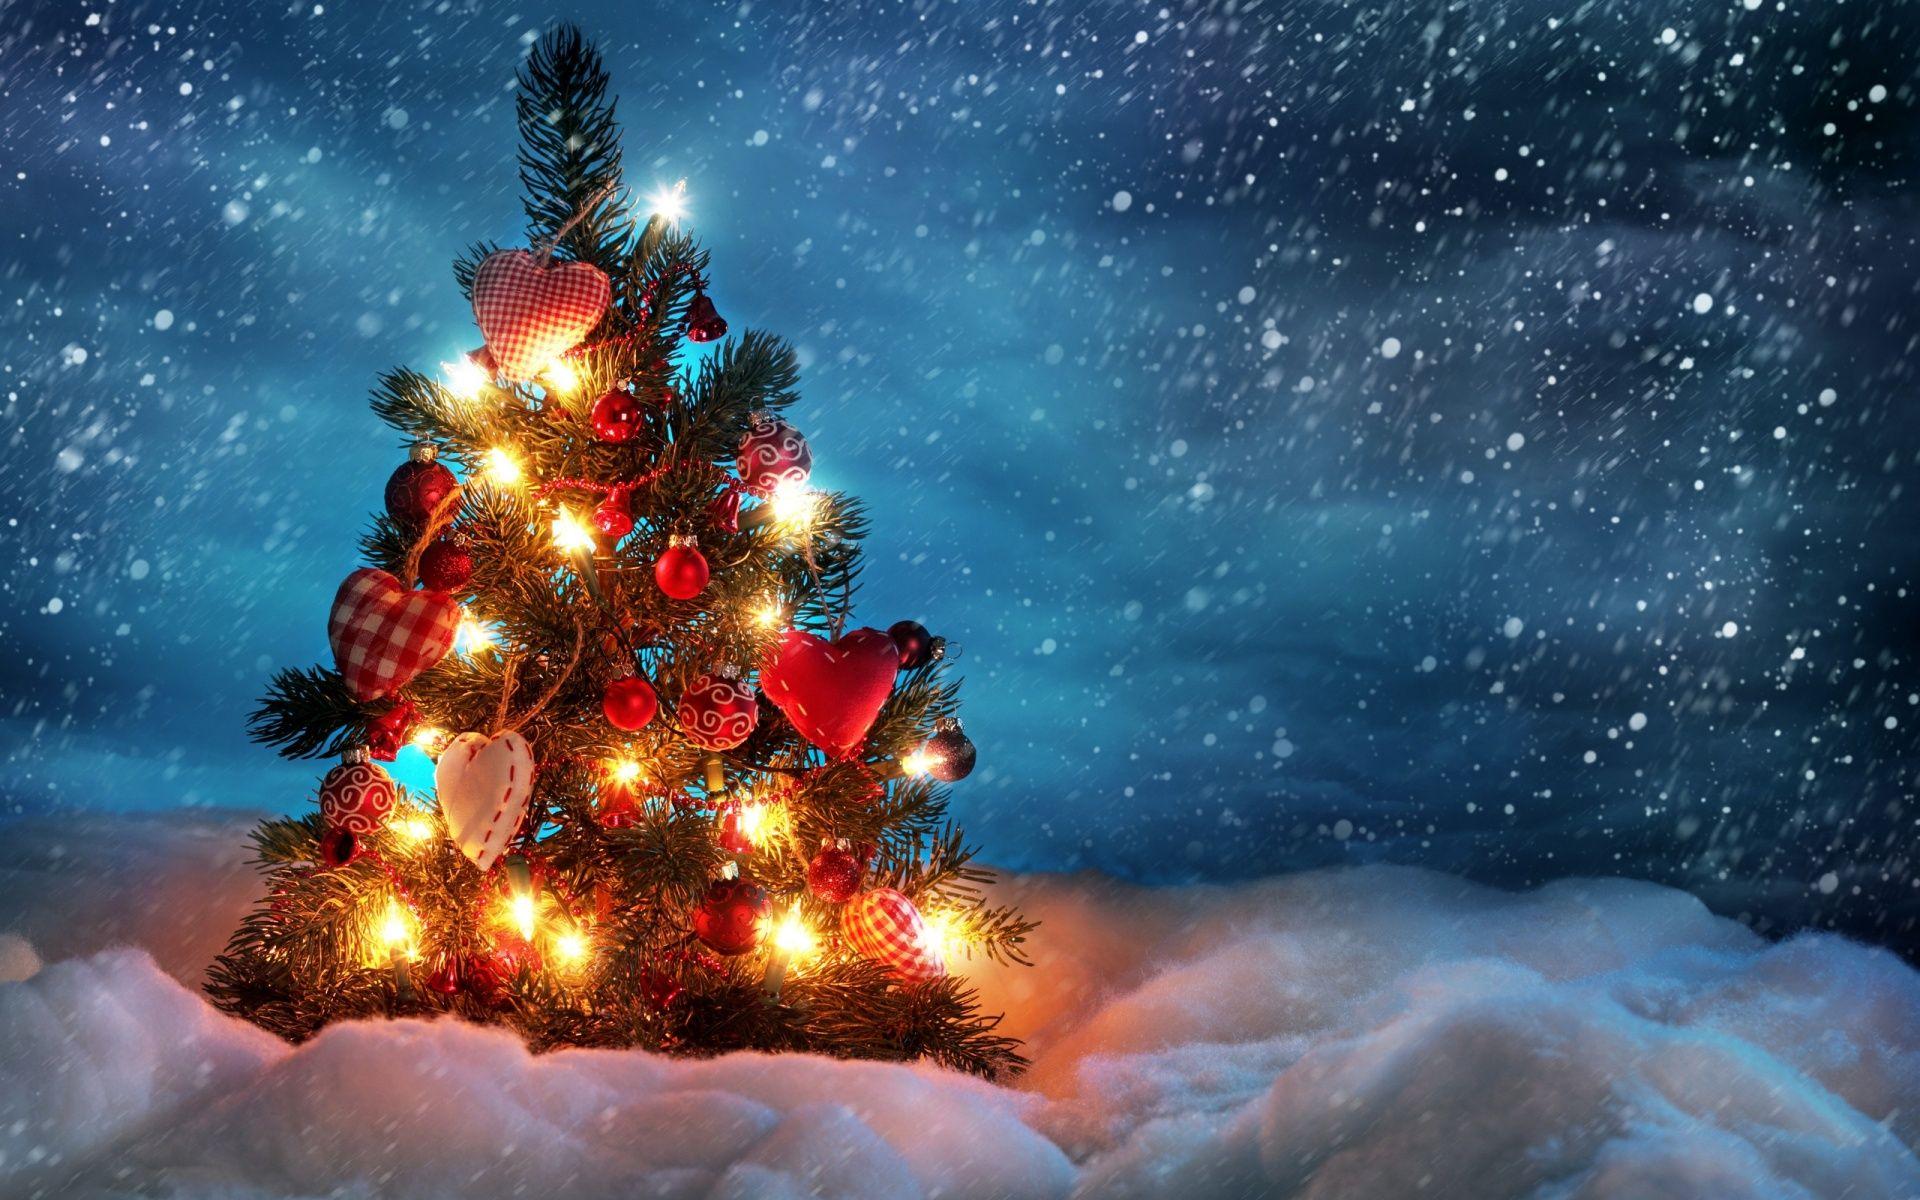 Christmas Artwork Starry Night Outside Lit Up Christmas Tree ...